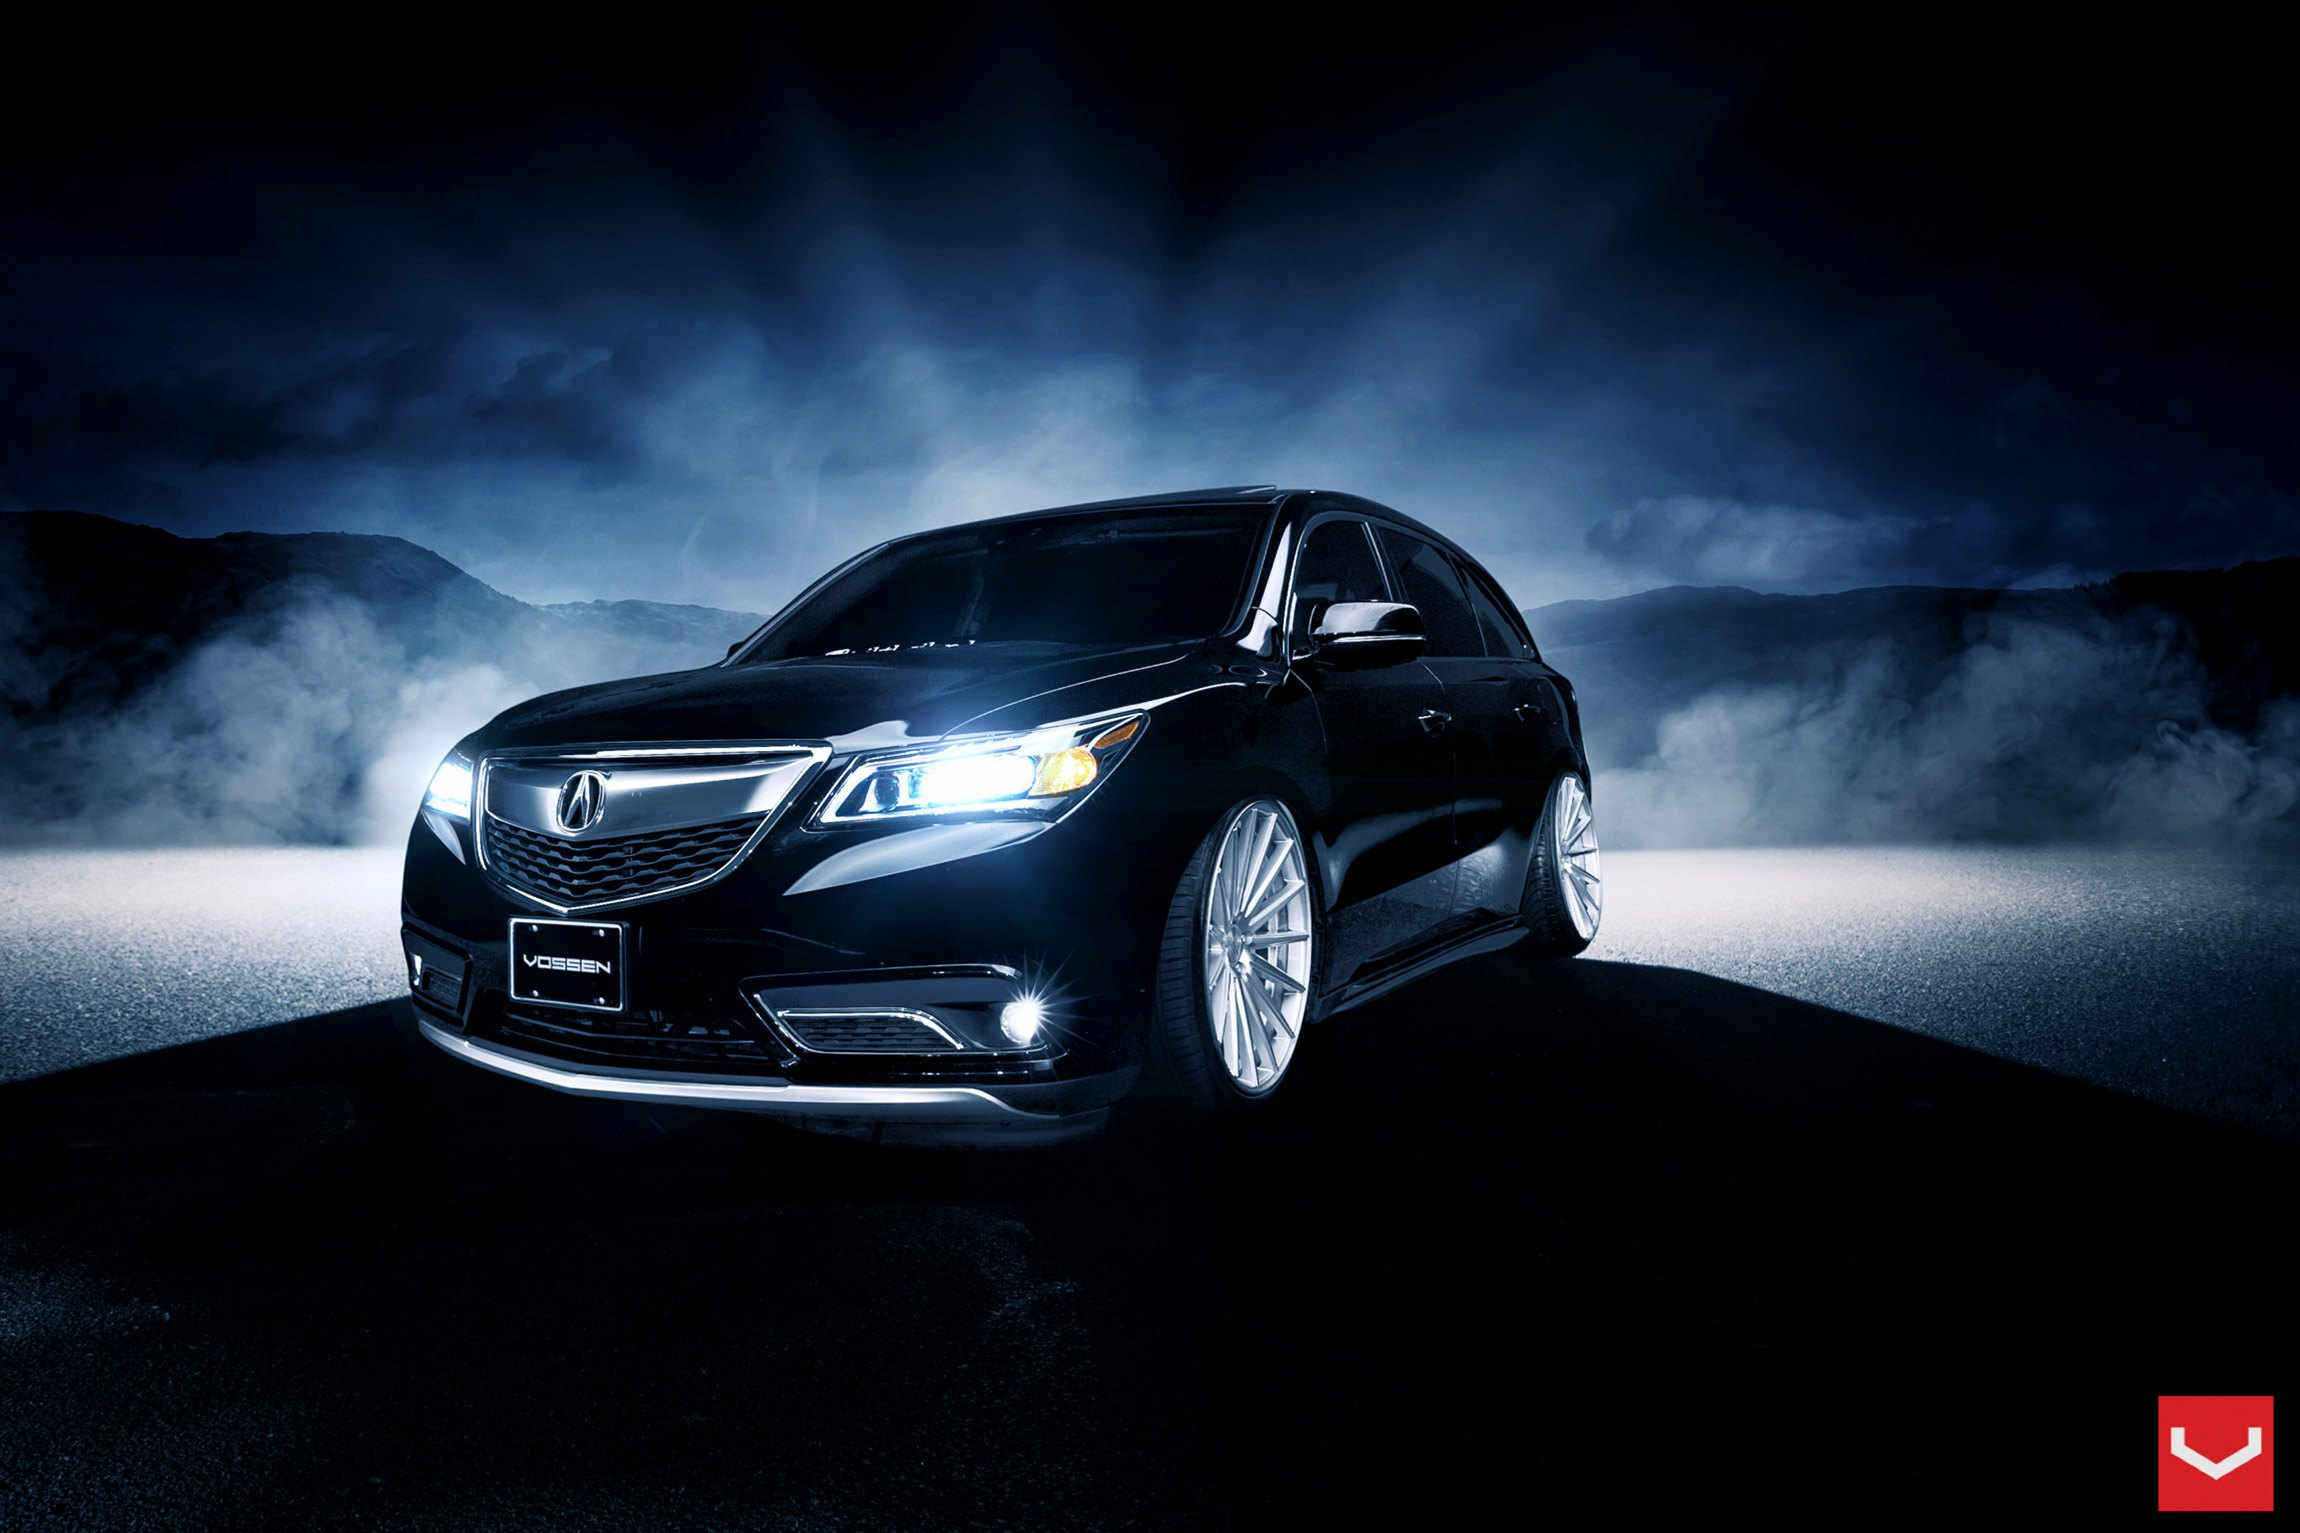 Custom Acura Mdx Images Mods Photos Upgrades Carid